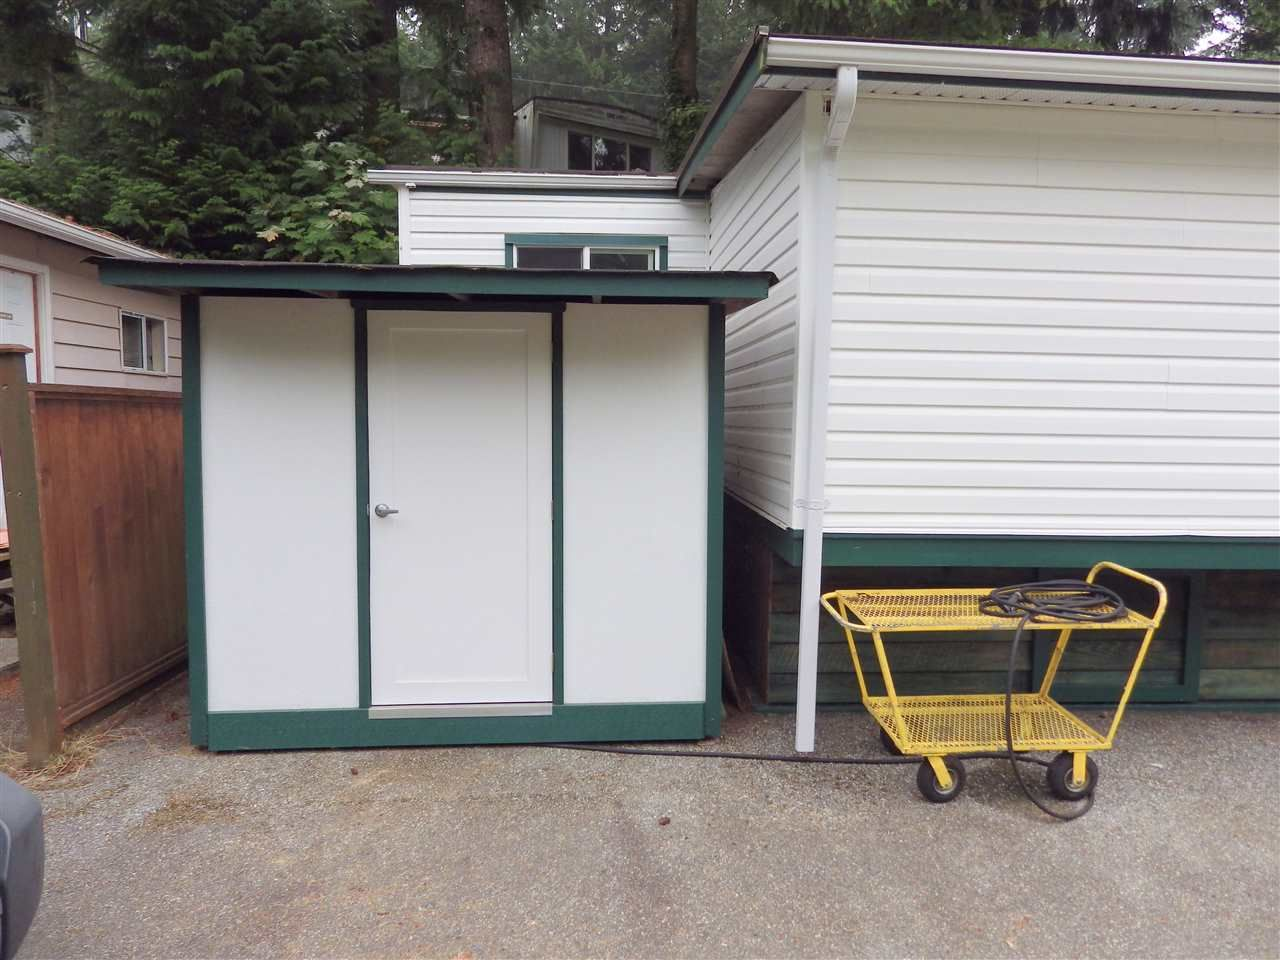 Photo 14: Photos: 3 5302 SELMA PARK Road in Sechelt: Sechelt District Manufactured Home for sale (Sunshine Coast)  : MLS®# R2498079